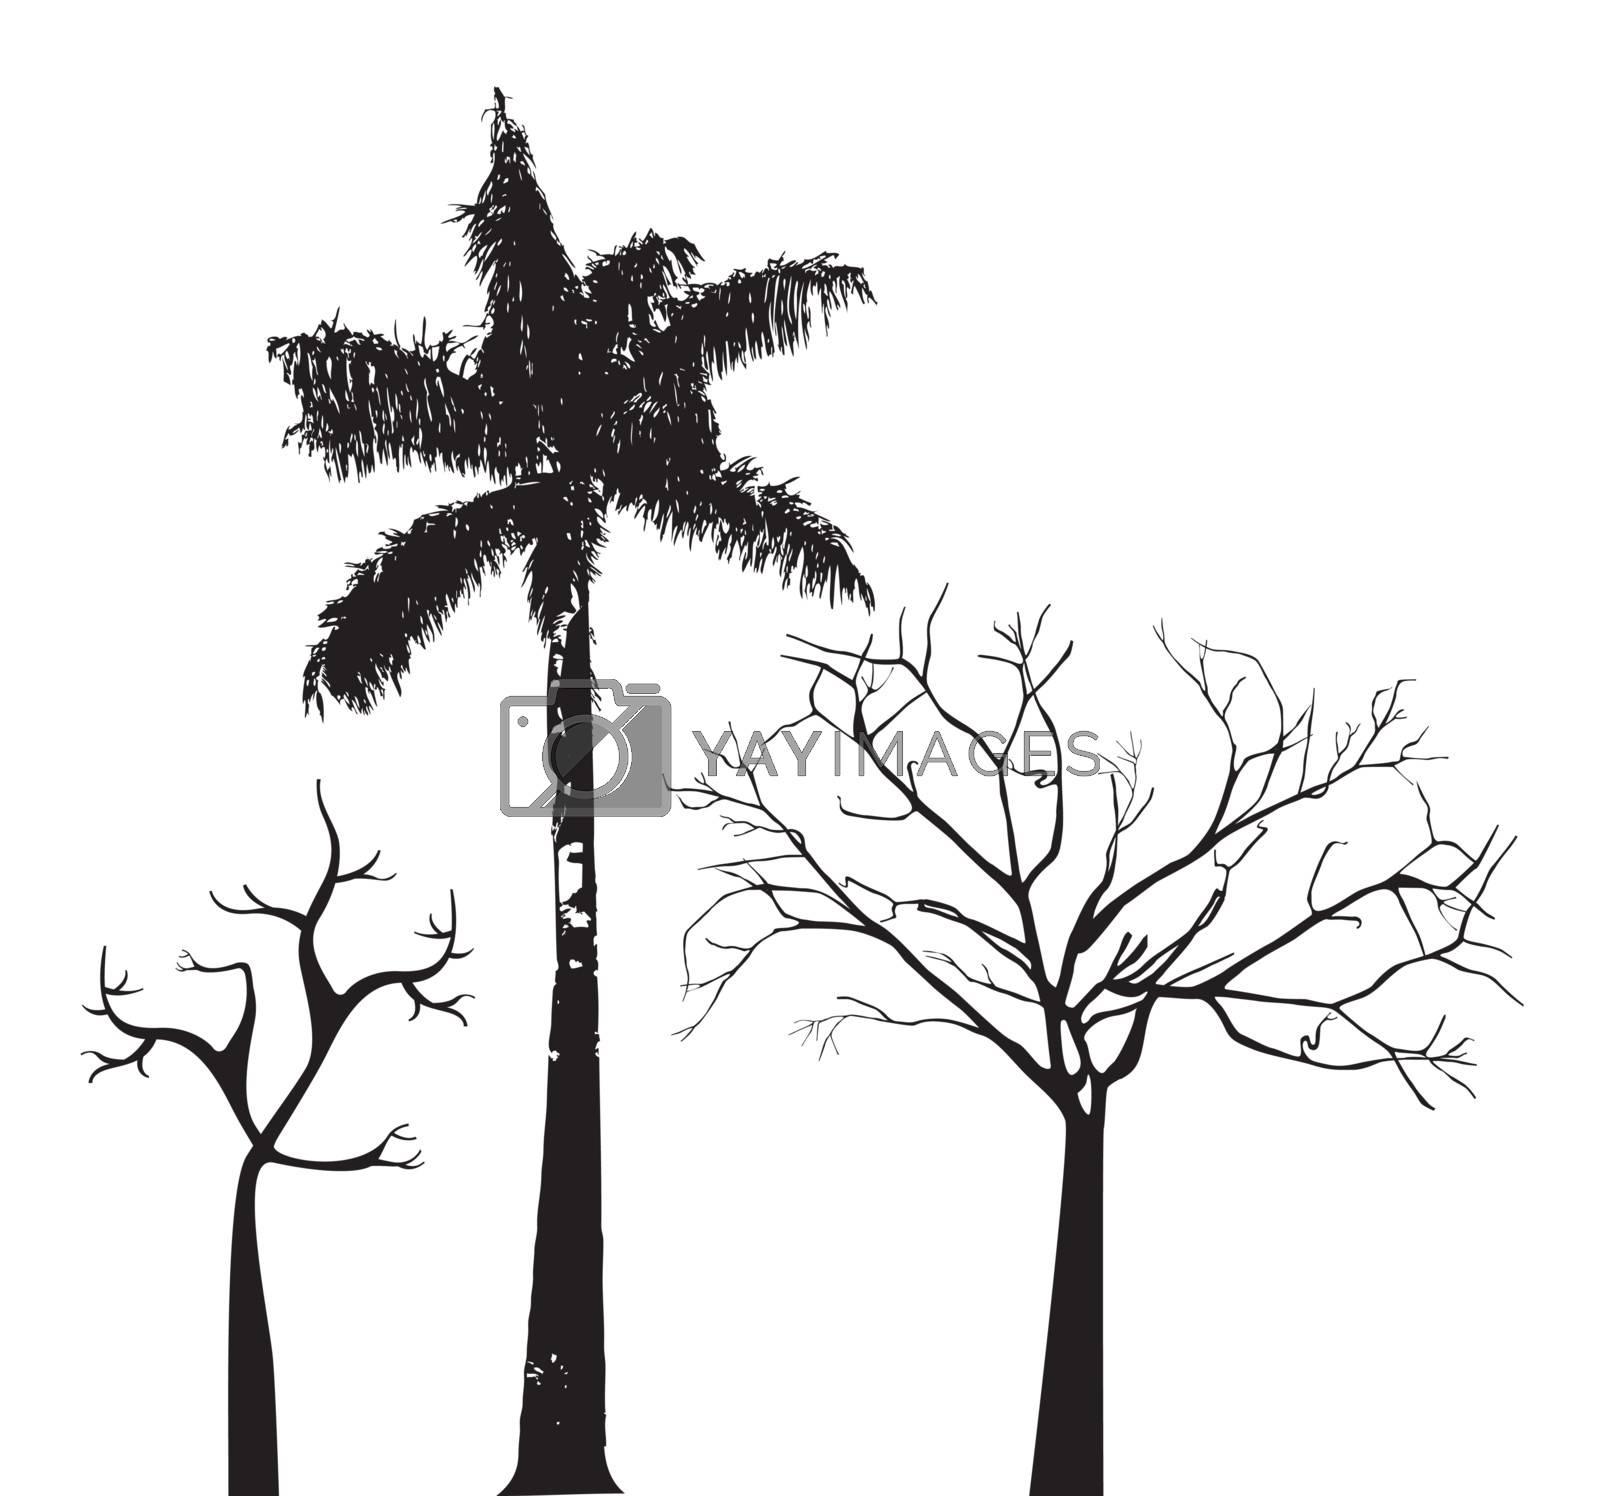 Tree over white background vector illustration. Natural background